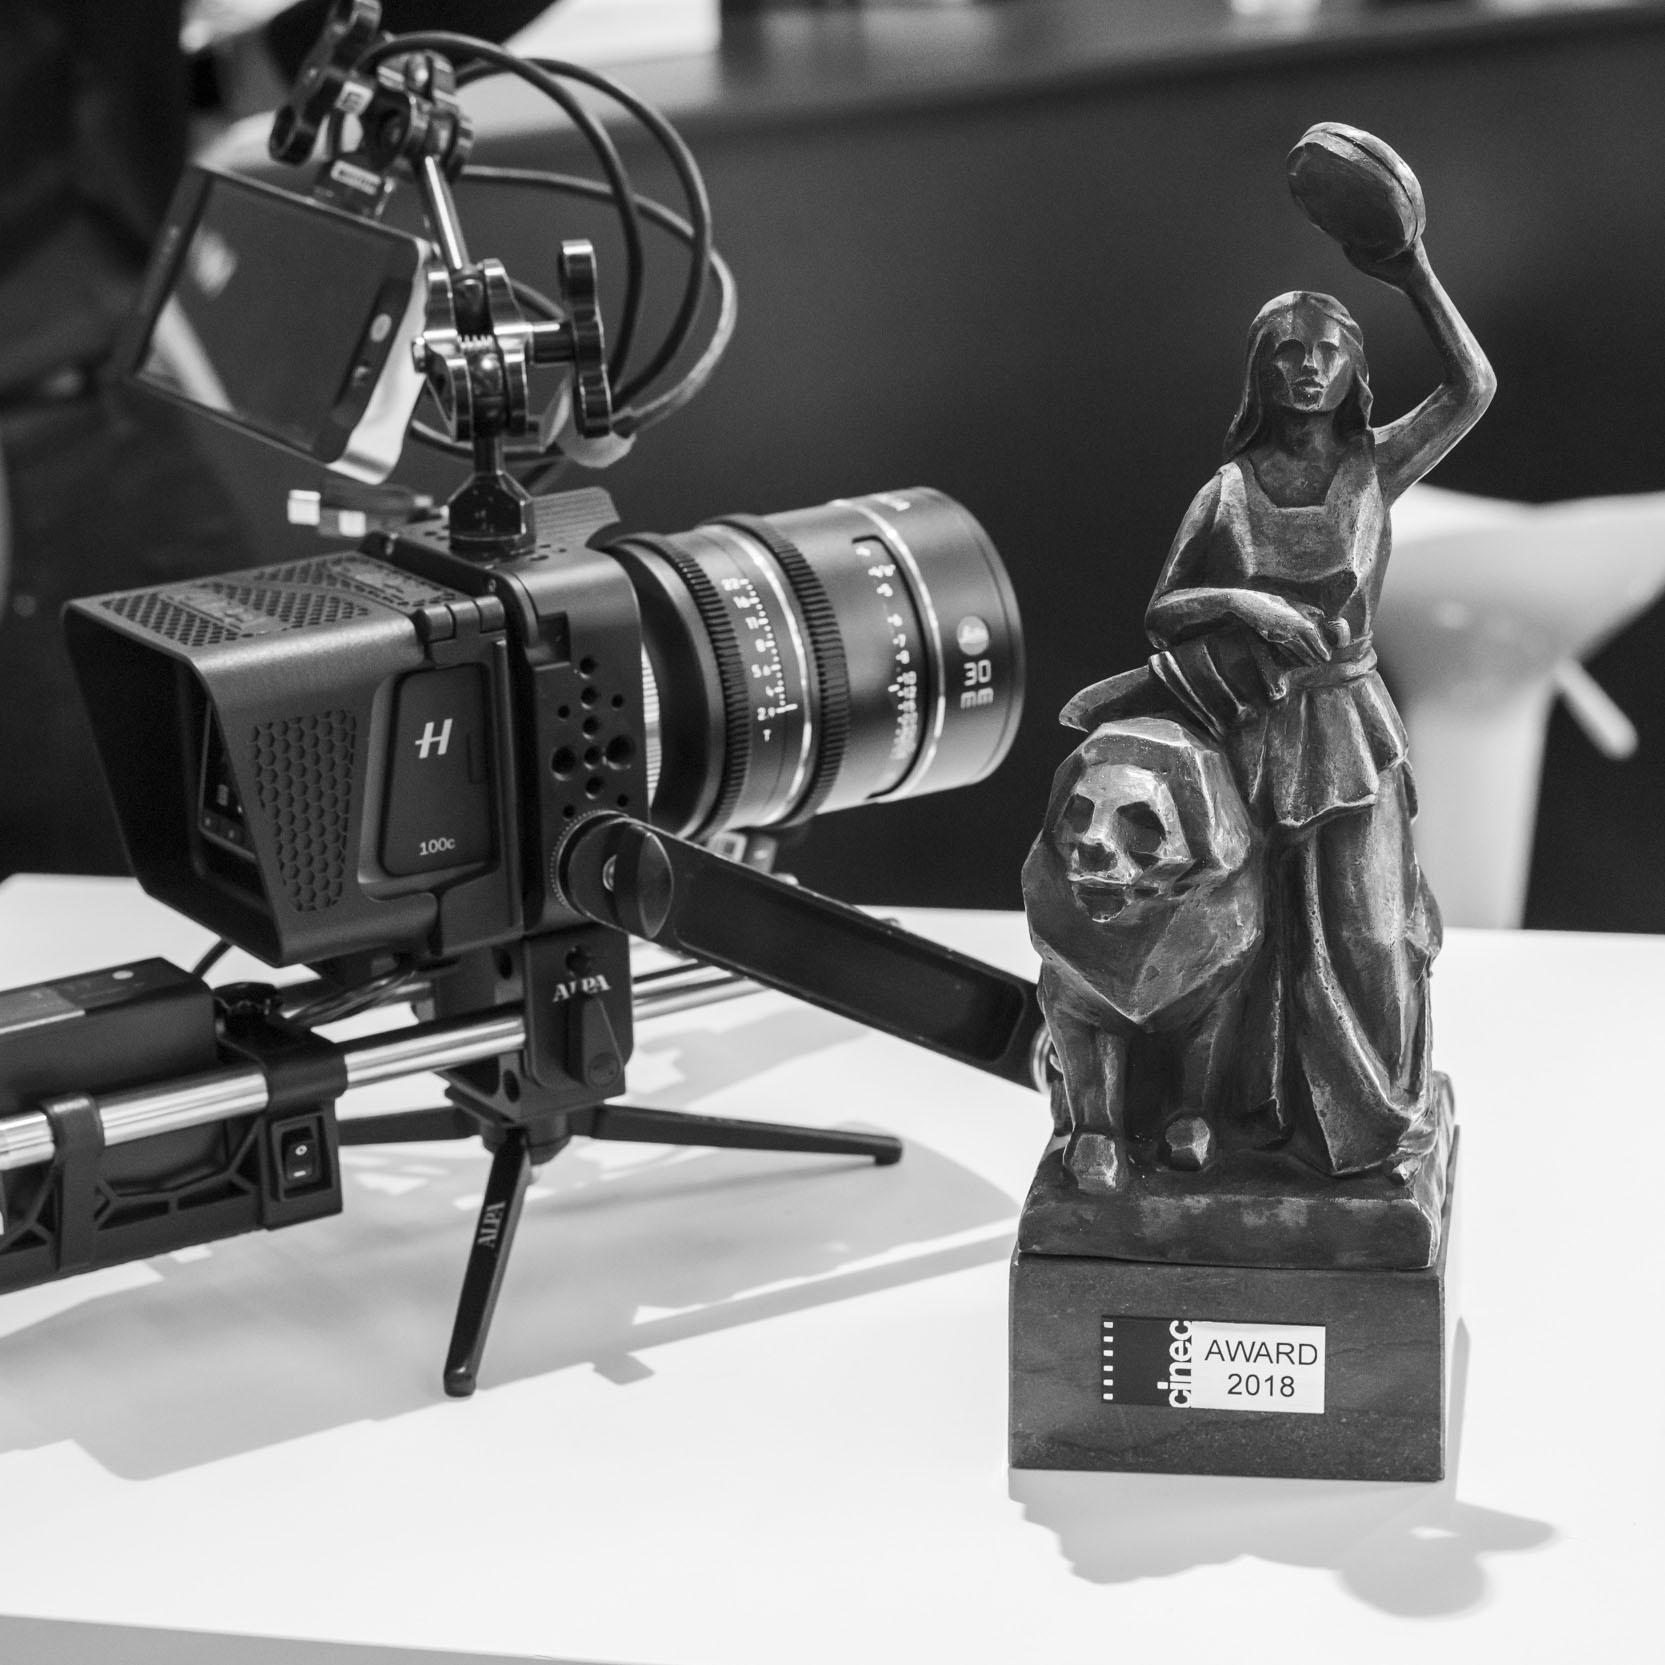 WE WON! PLATON wins cinecAward 2018